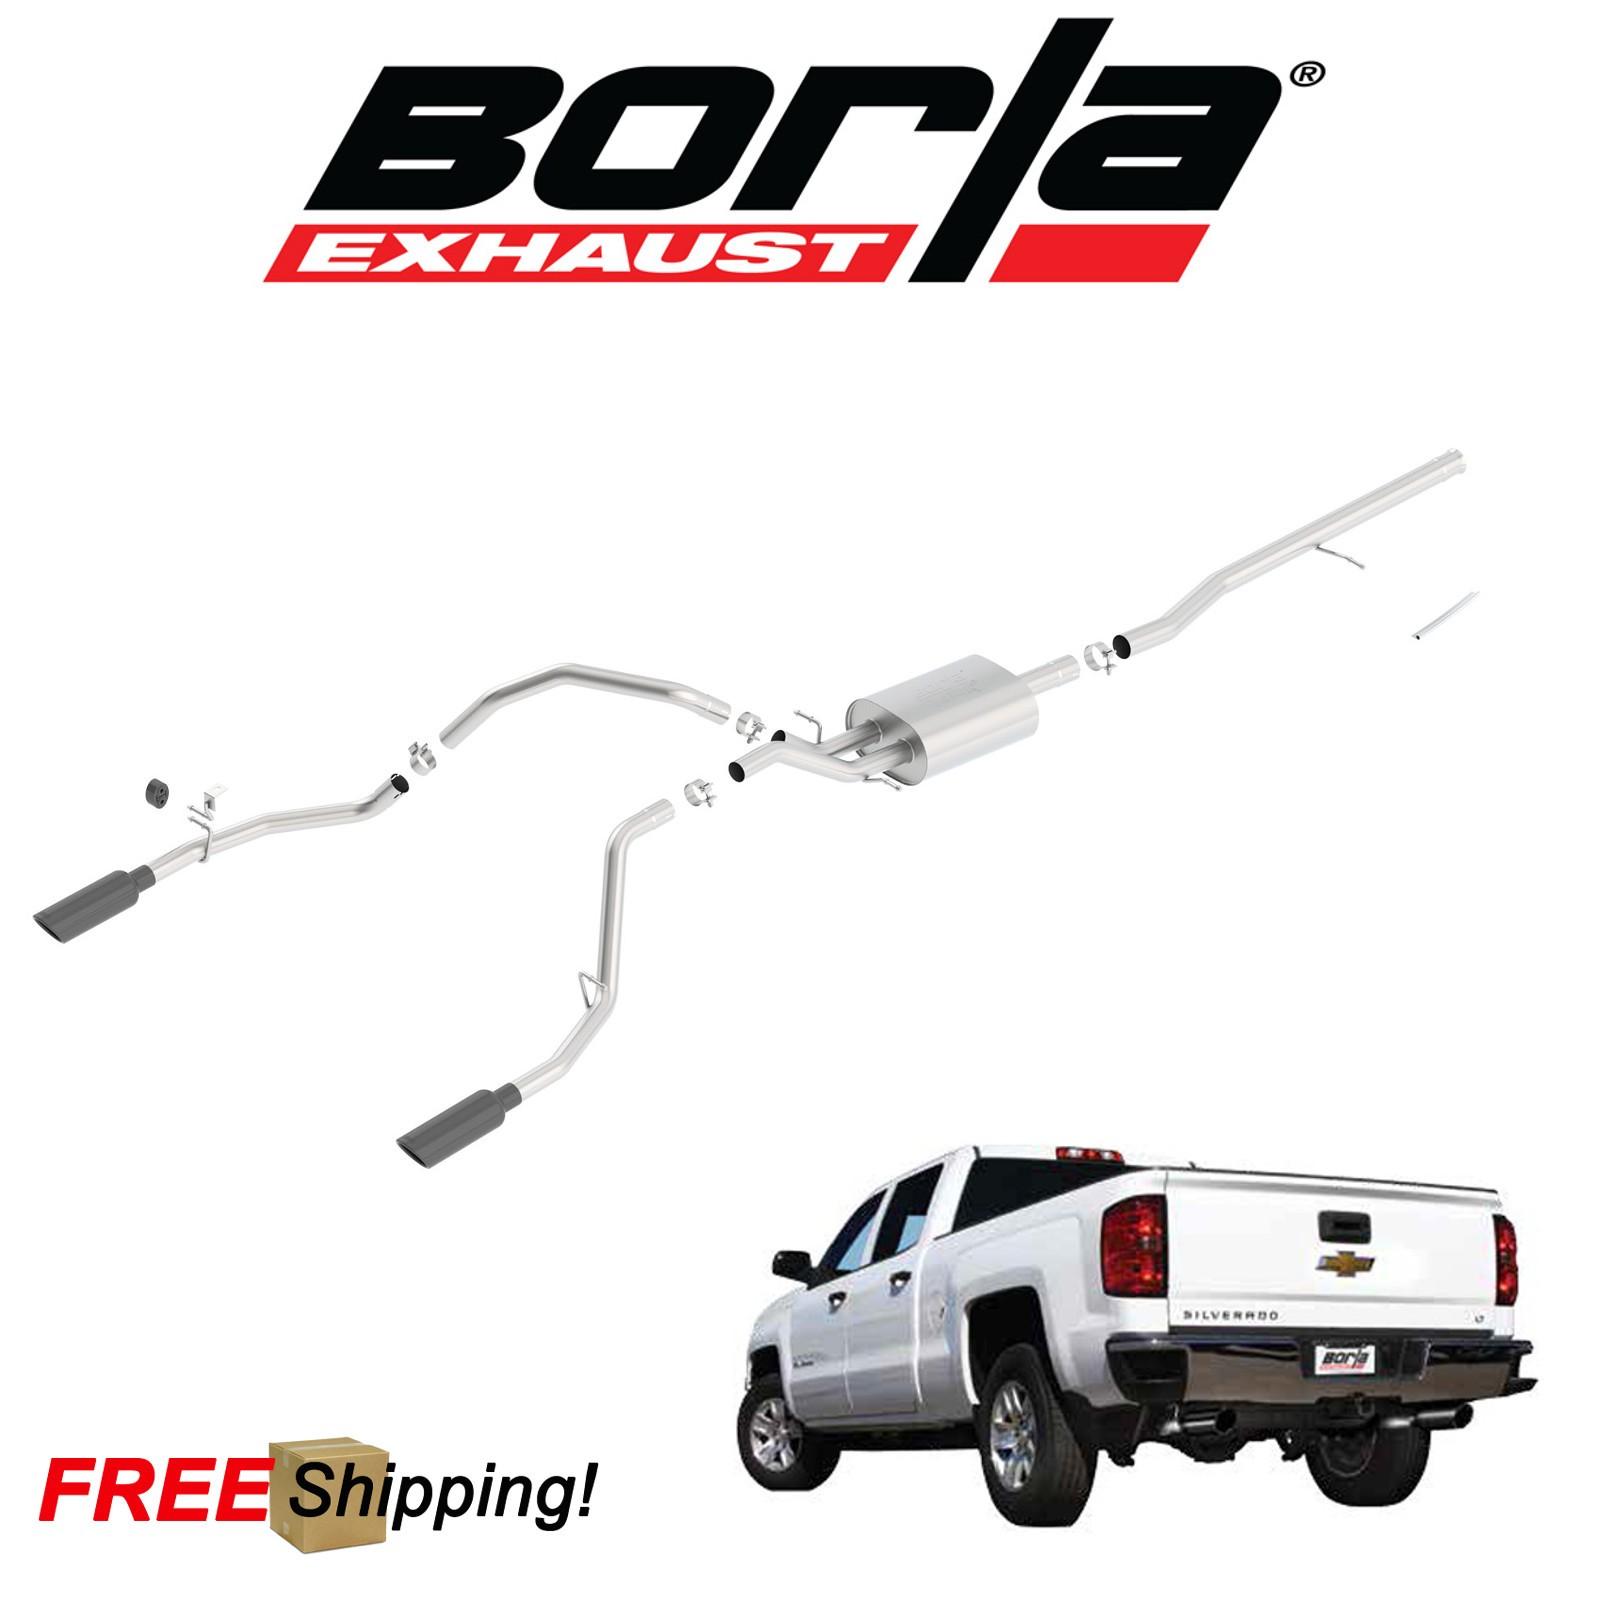 details about borla s type cat back performance dual exhaust 2014 2018 silverado 1500 5 3l v8